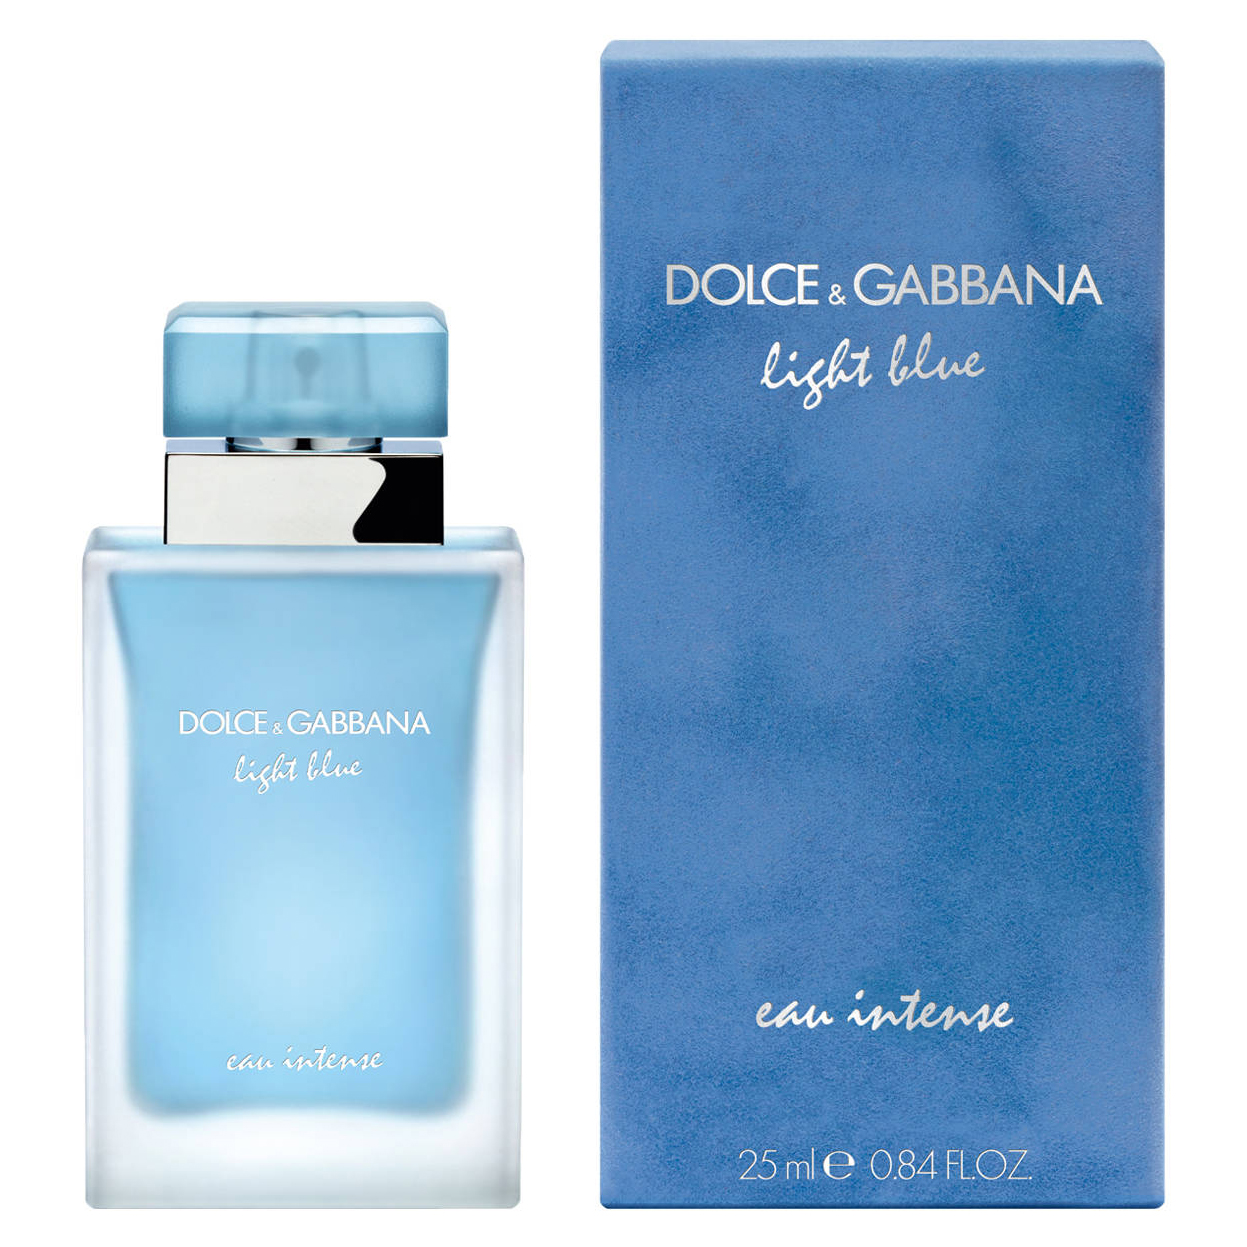 dolce gabbana pour femme intense parfum cerca compra vendi nuovo e usato dolce gabbana. Black Bedroom Furniture Sets. Home Design Ideas